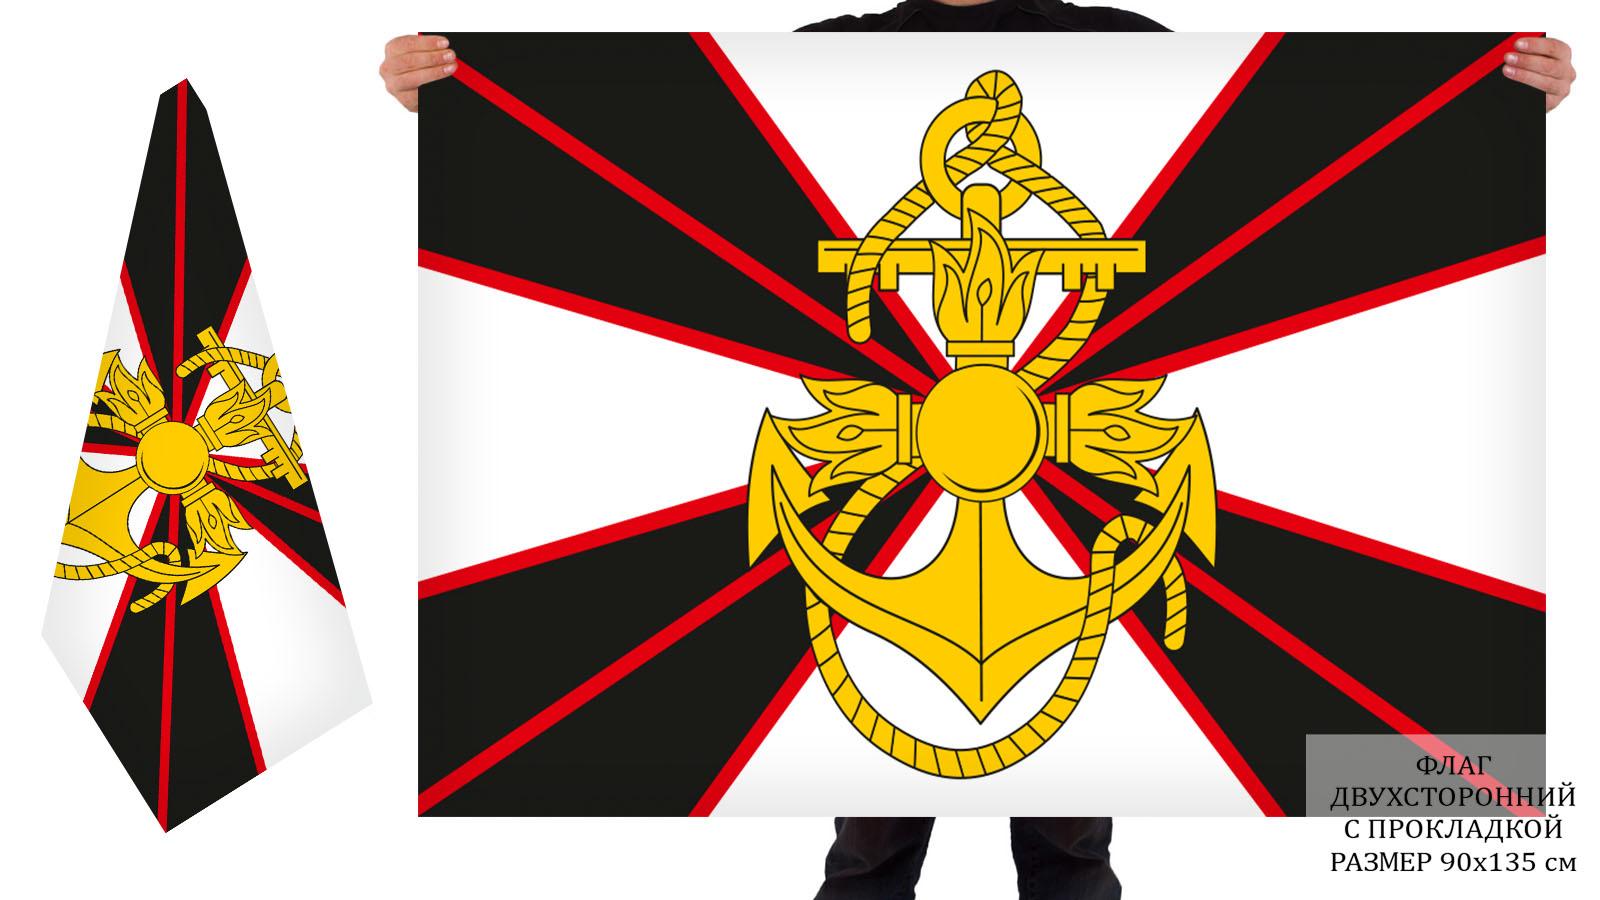 Новый флаг Морской пехоты двусторонний